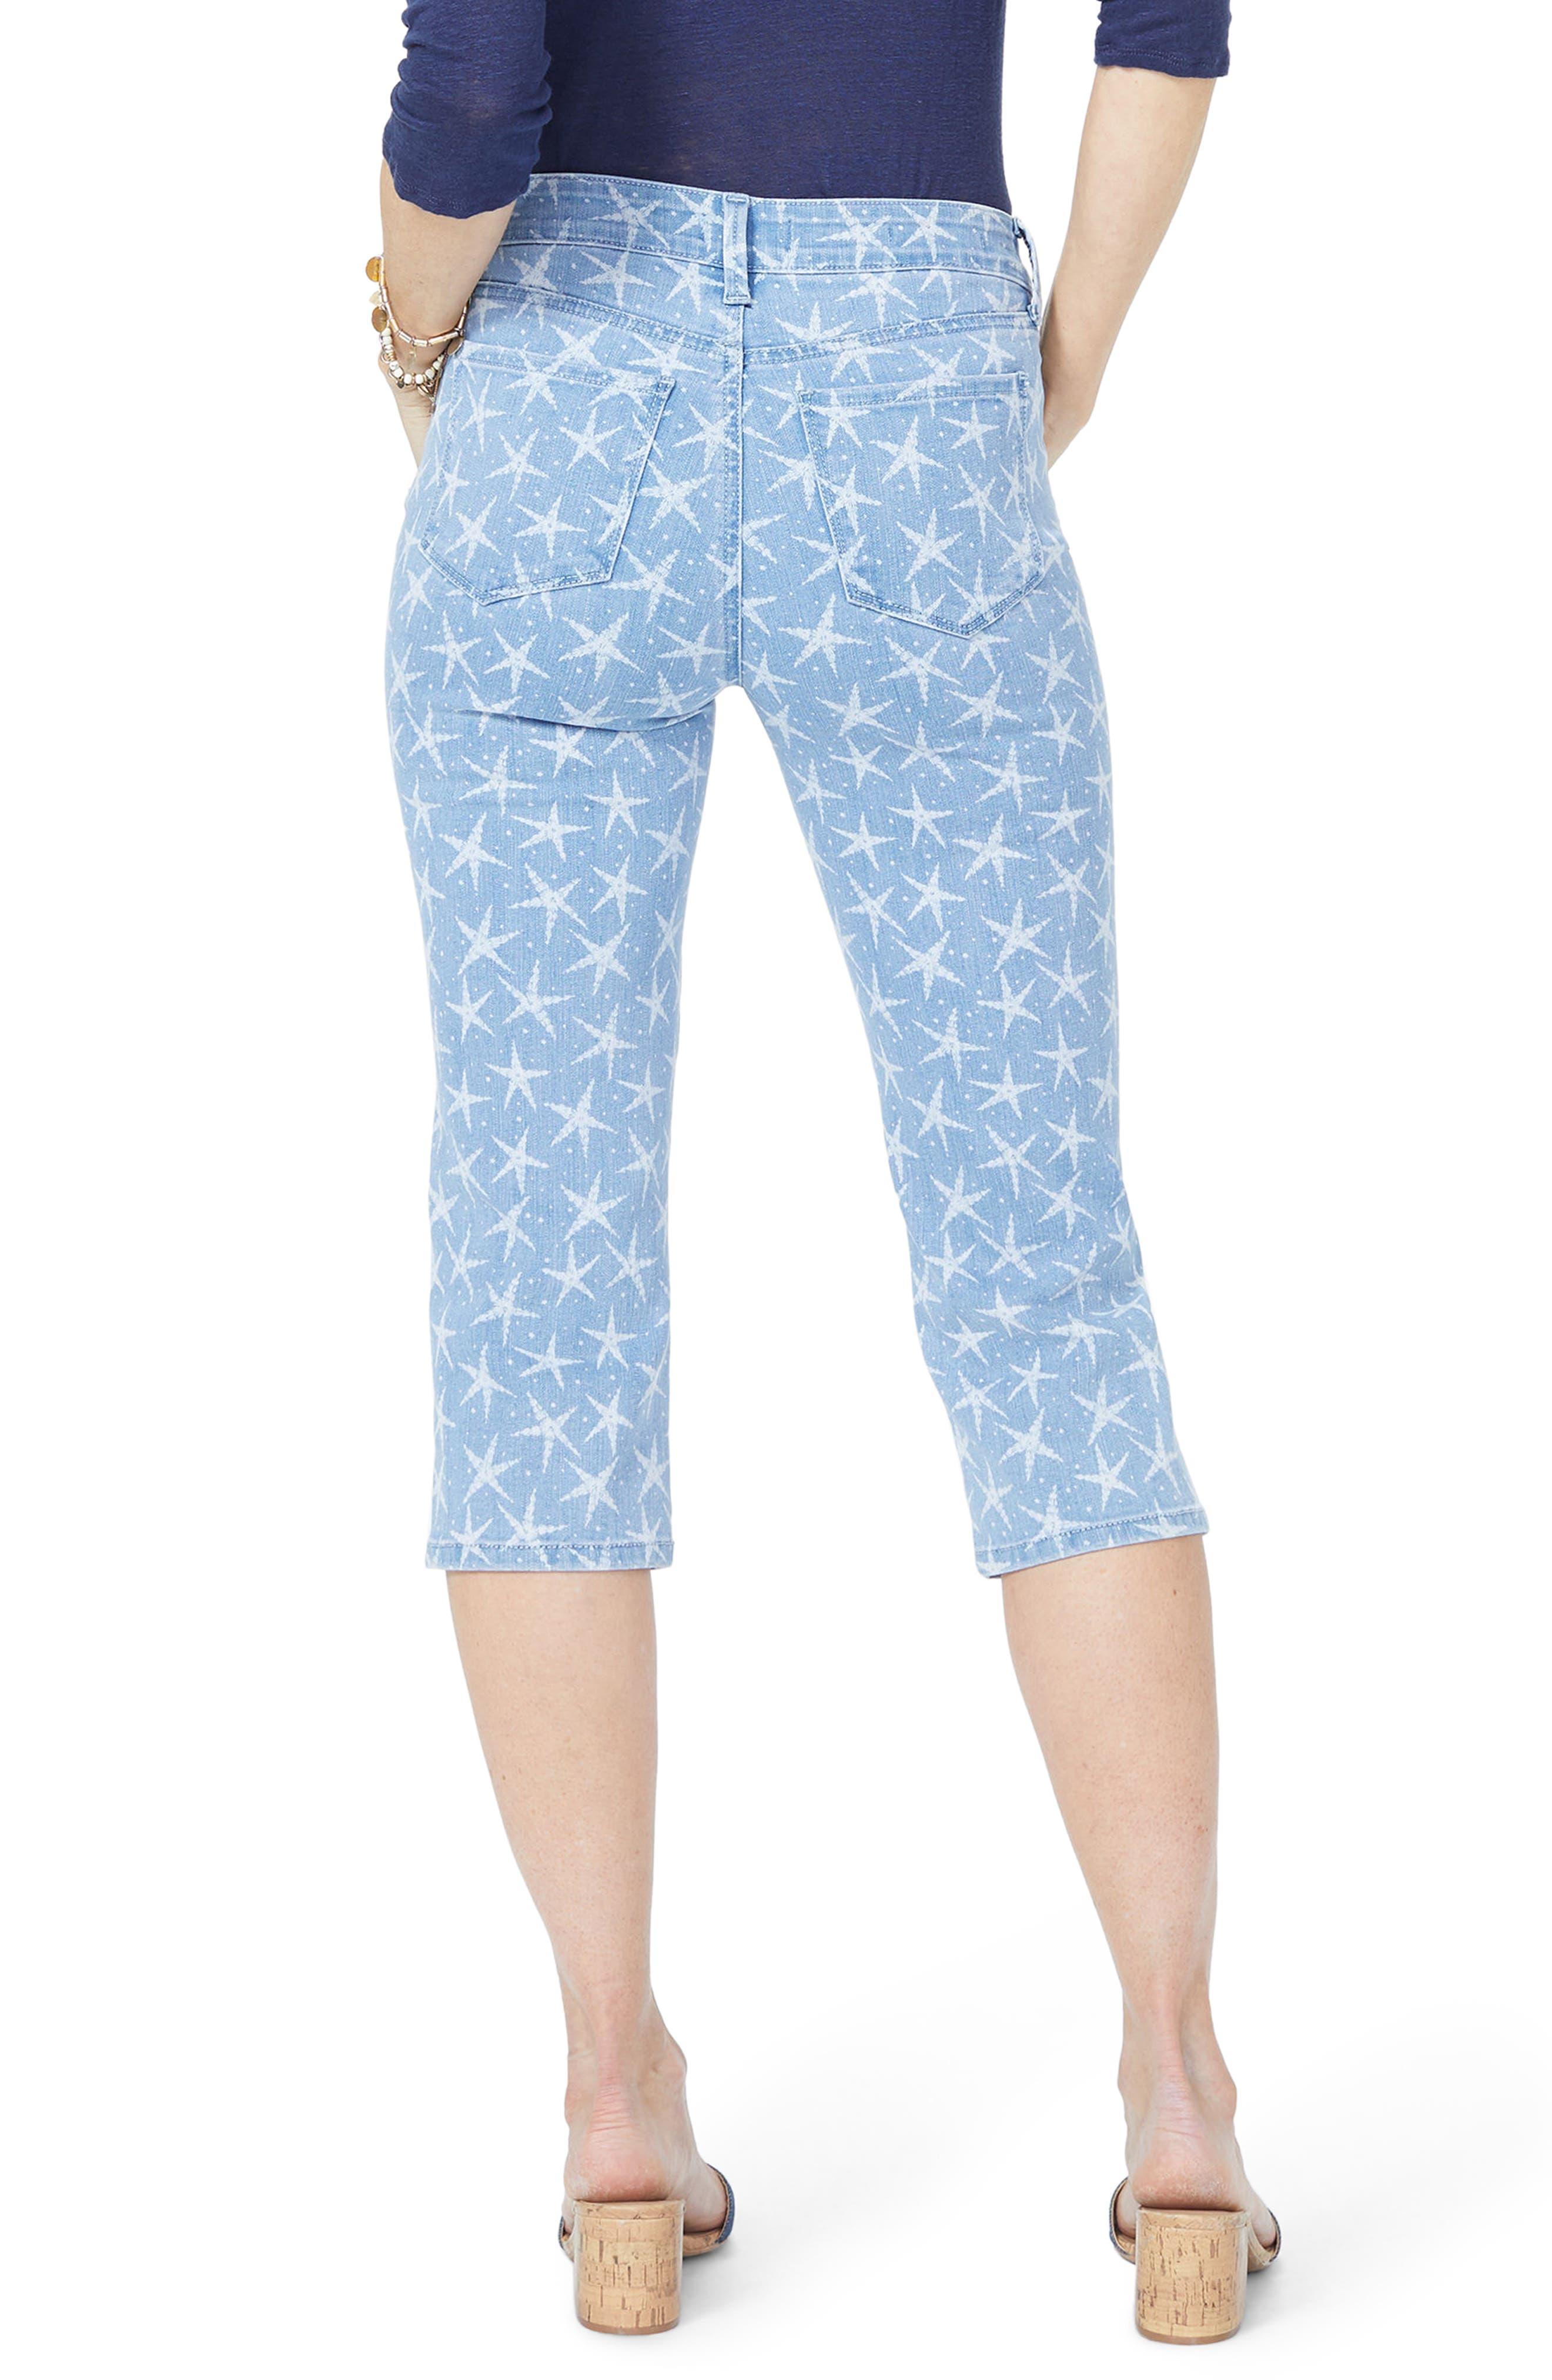 NYDJ, High Waist Seastar Print Stretch Crop Jeans, Alternate thumbnail 2, color, SEASTAR DISCHARGE PRINT